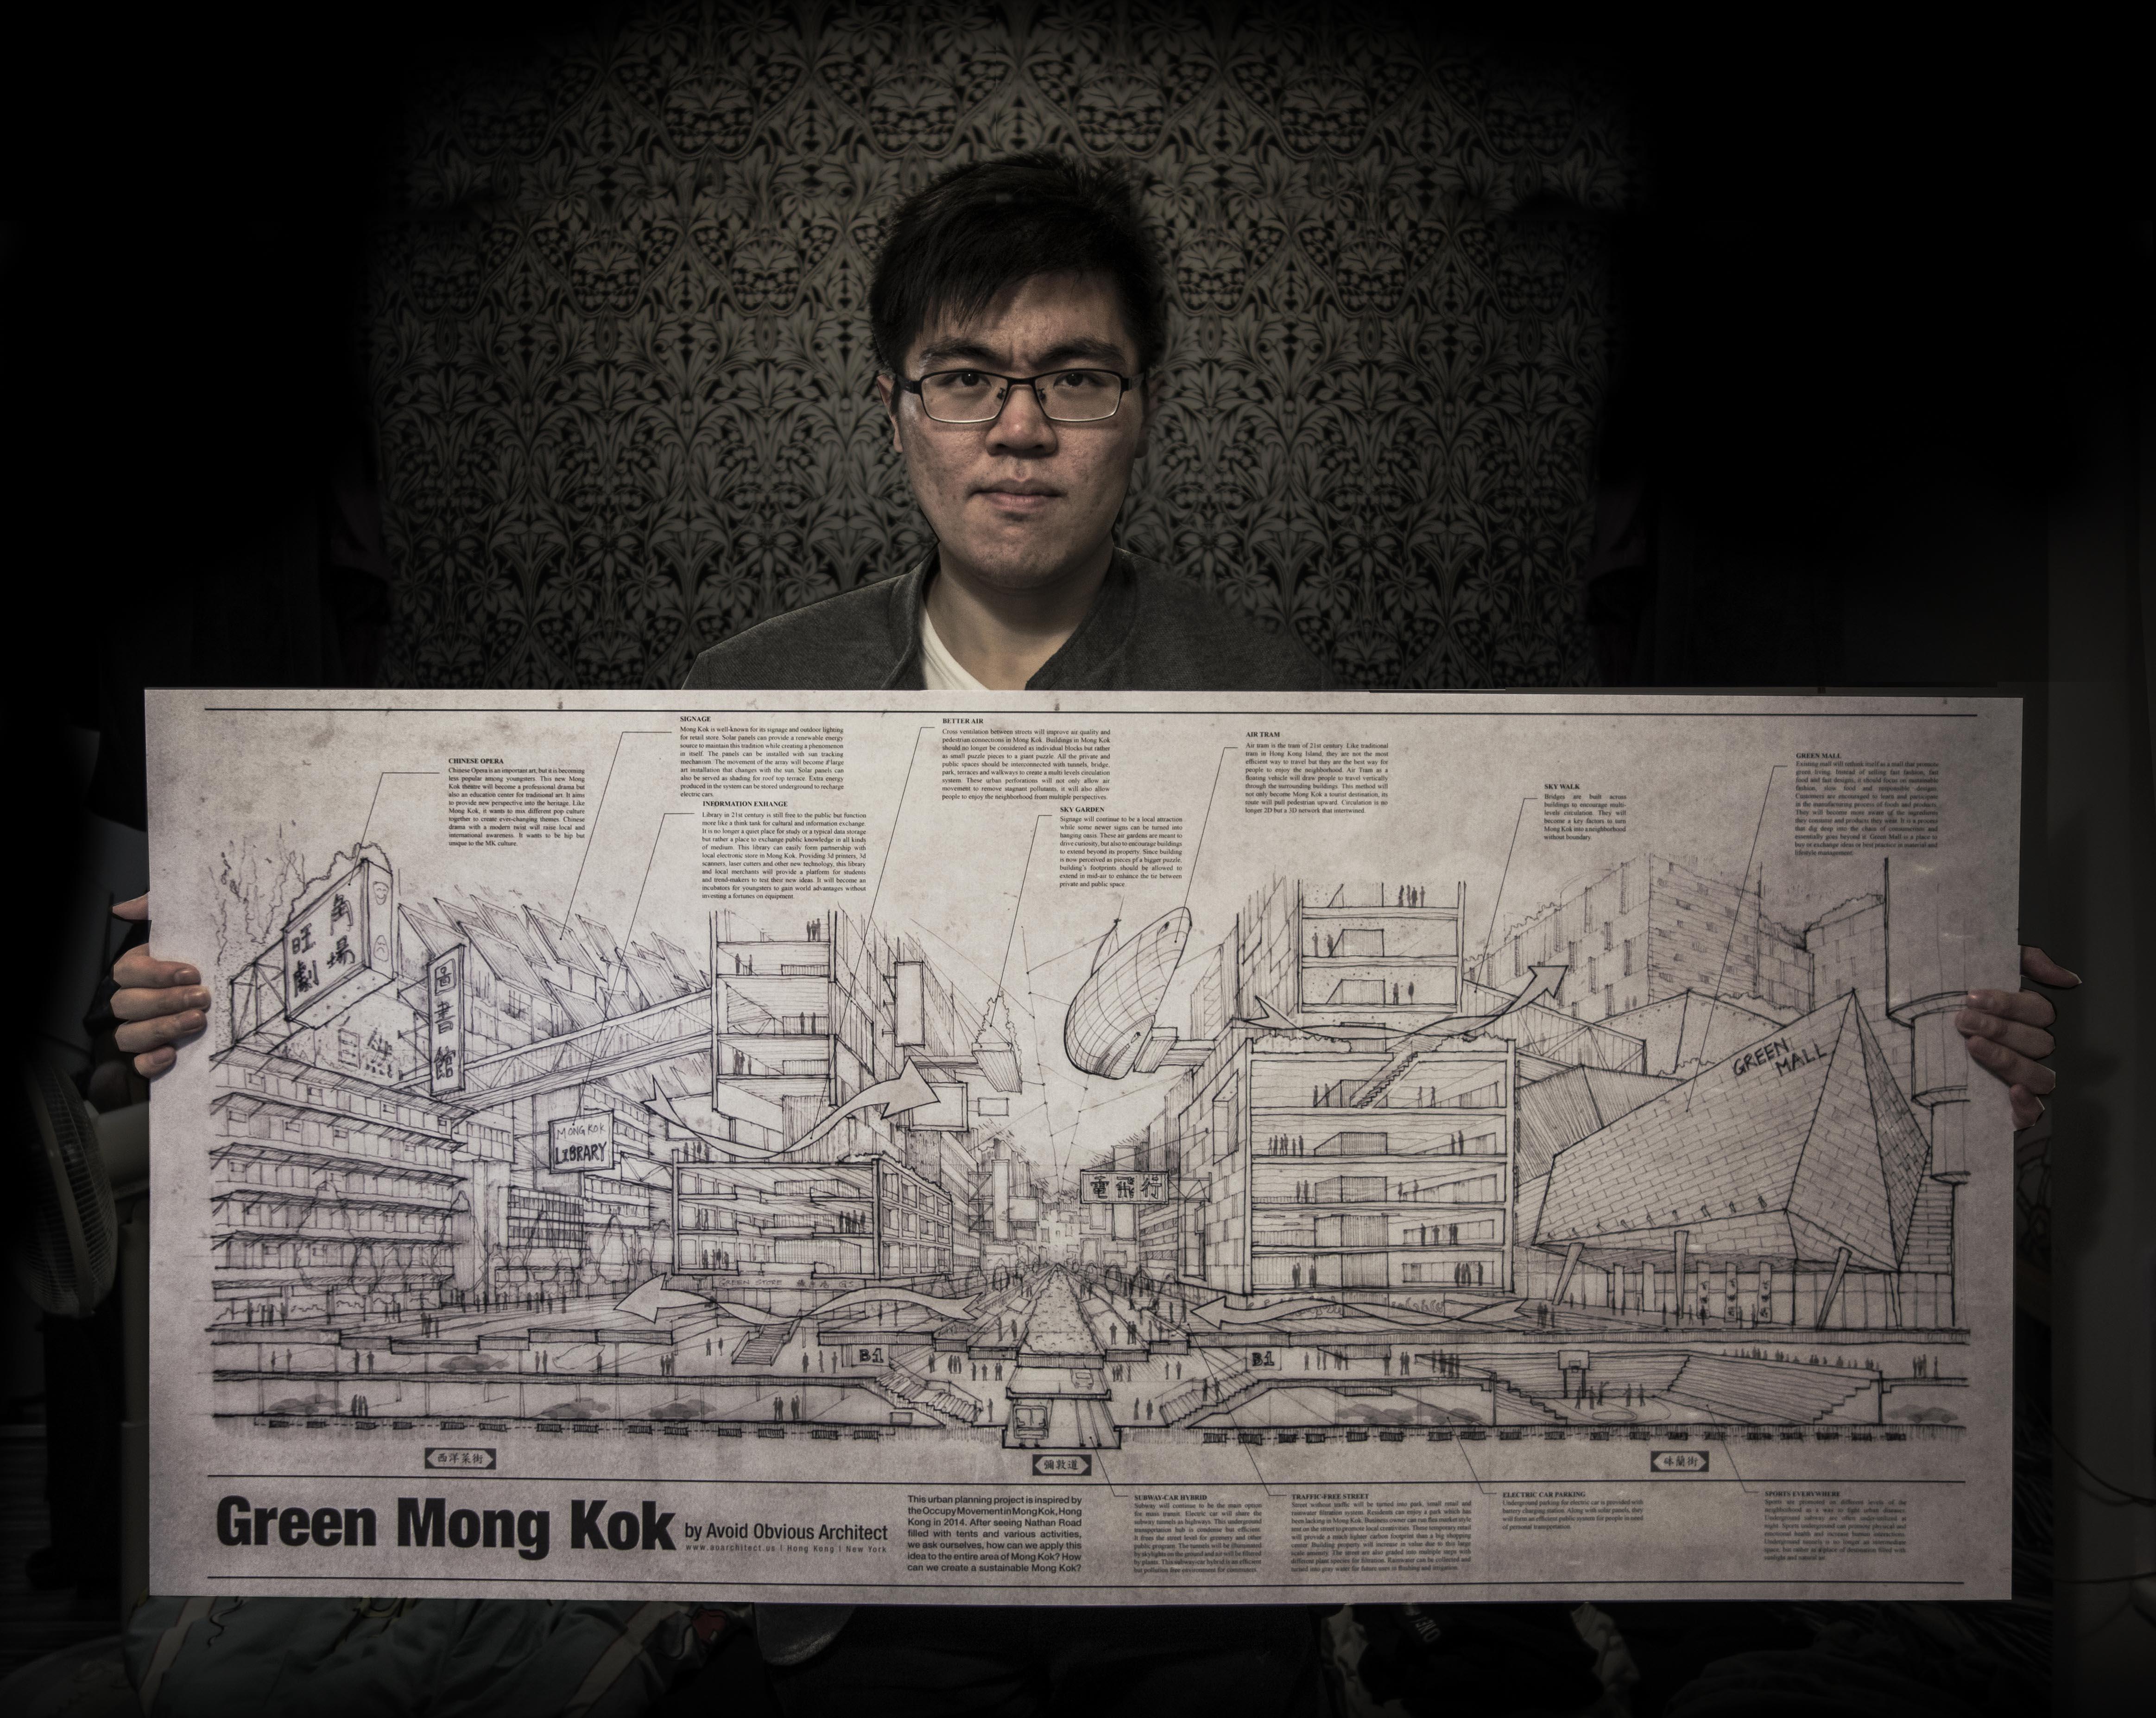 Hong Kong, Occupy Movement, Mong Kok, Urban Planning, Flying Cars, cross ventilation, solar panels, green mall, park, urban landscape